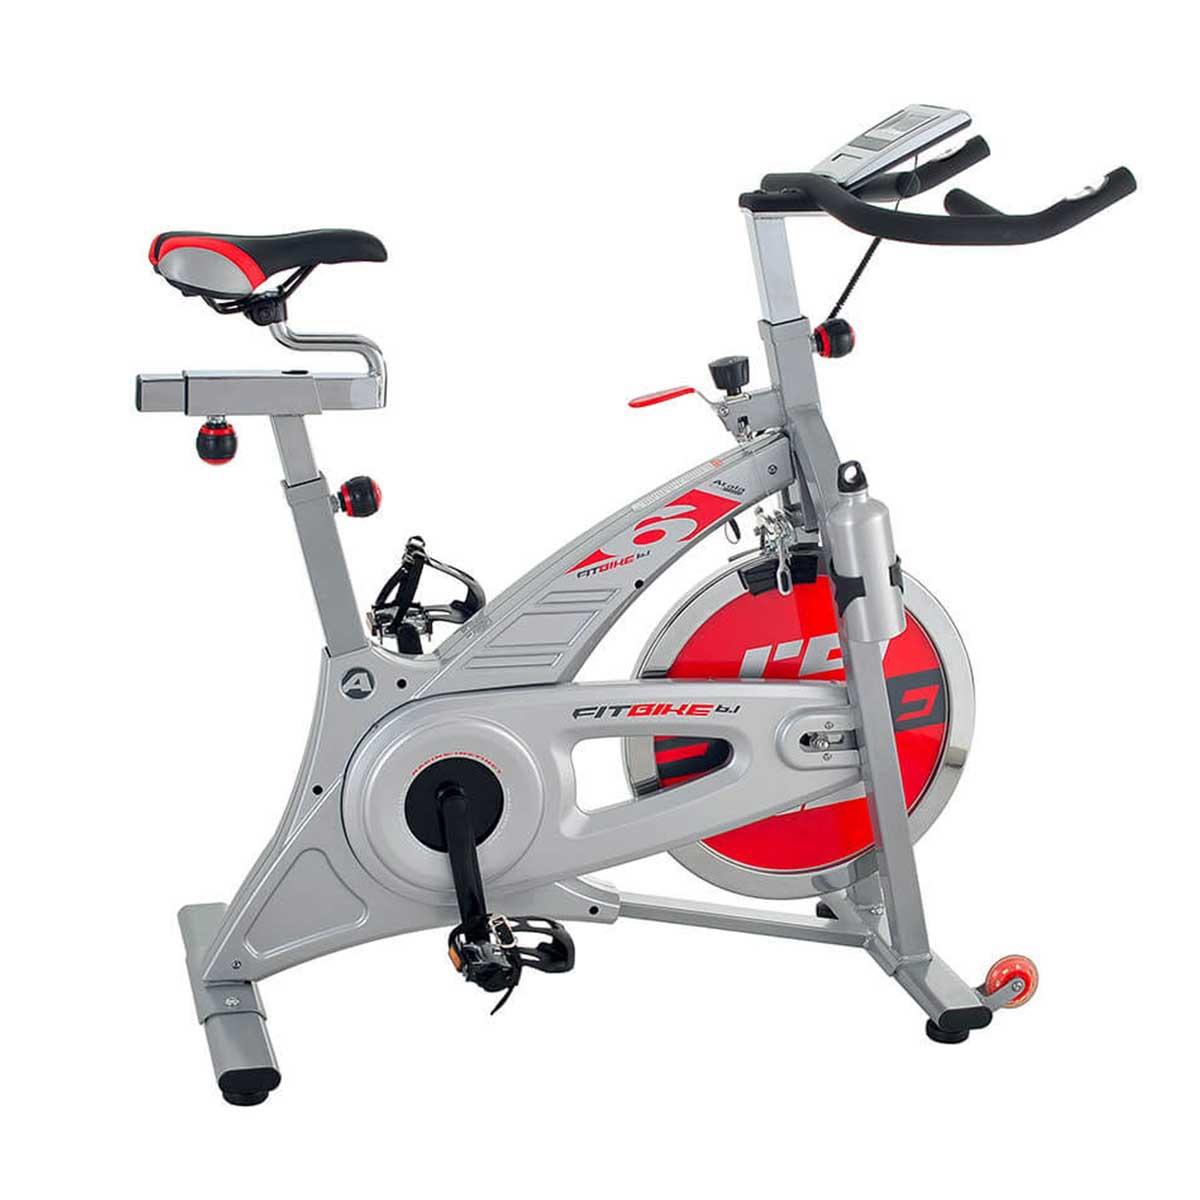 Atala-Fit-bike-6